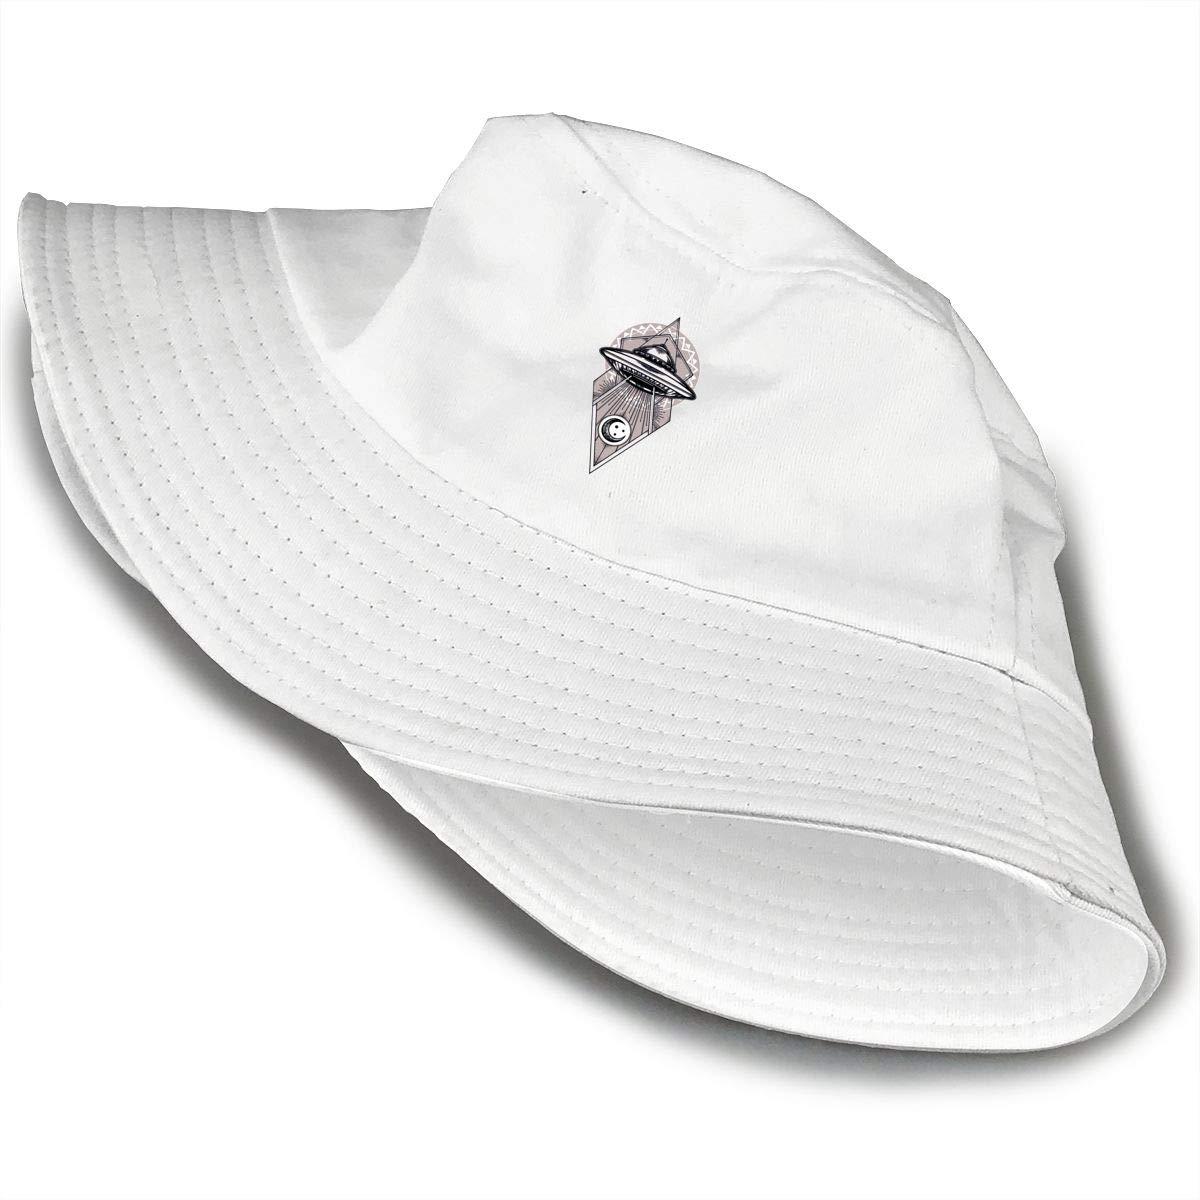 NDFGR Alien Research Institute Unisex Cotton Packable Black Travel Bucket Hat Fishing Cap